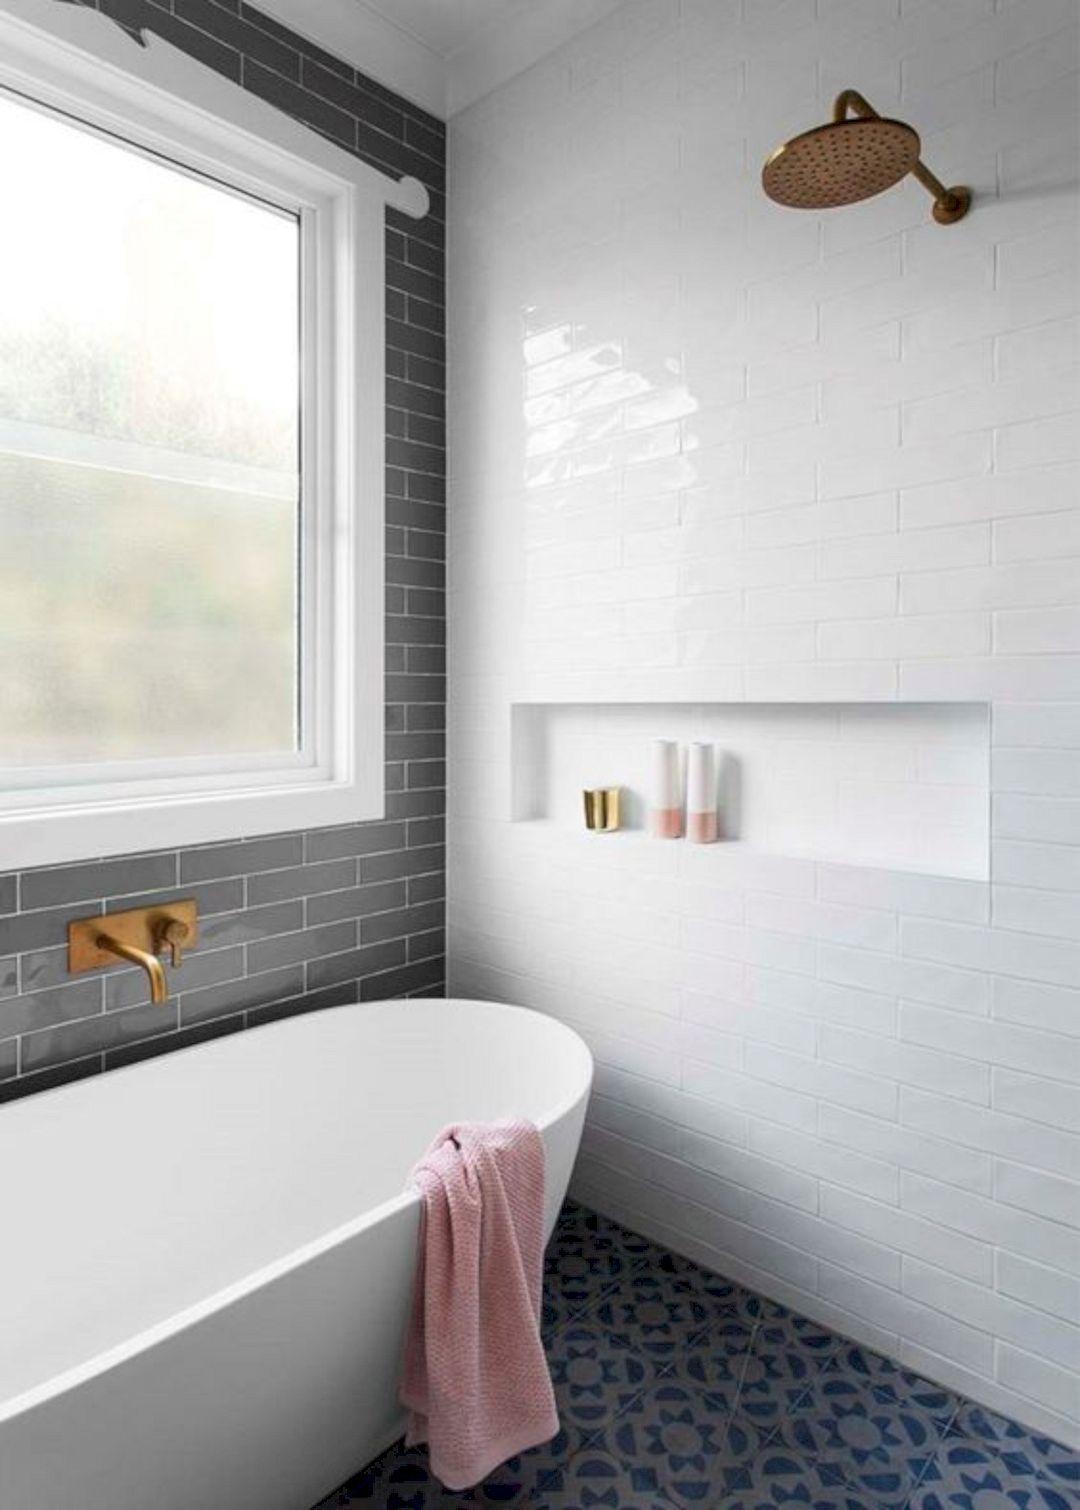 Small Bathroom Renovation Ideas 10 | Bathroom | Pinterest | Small ...